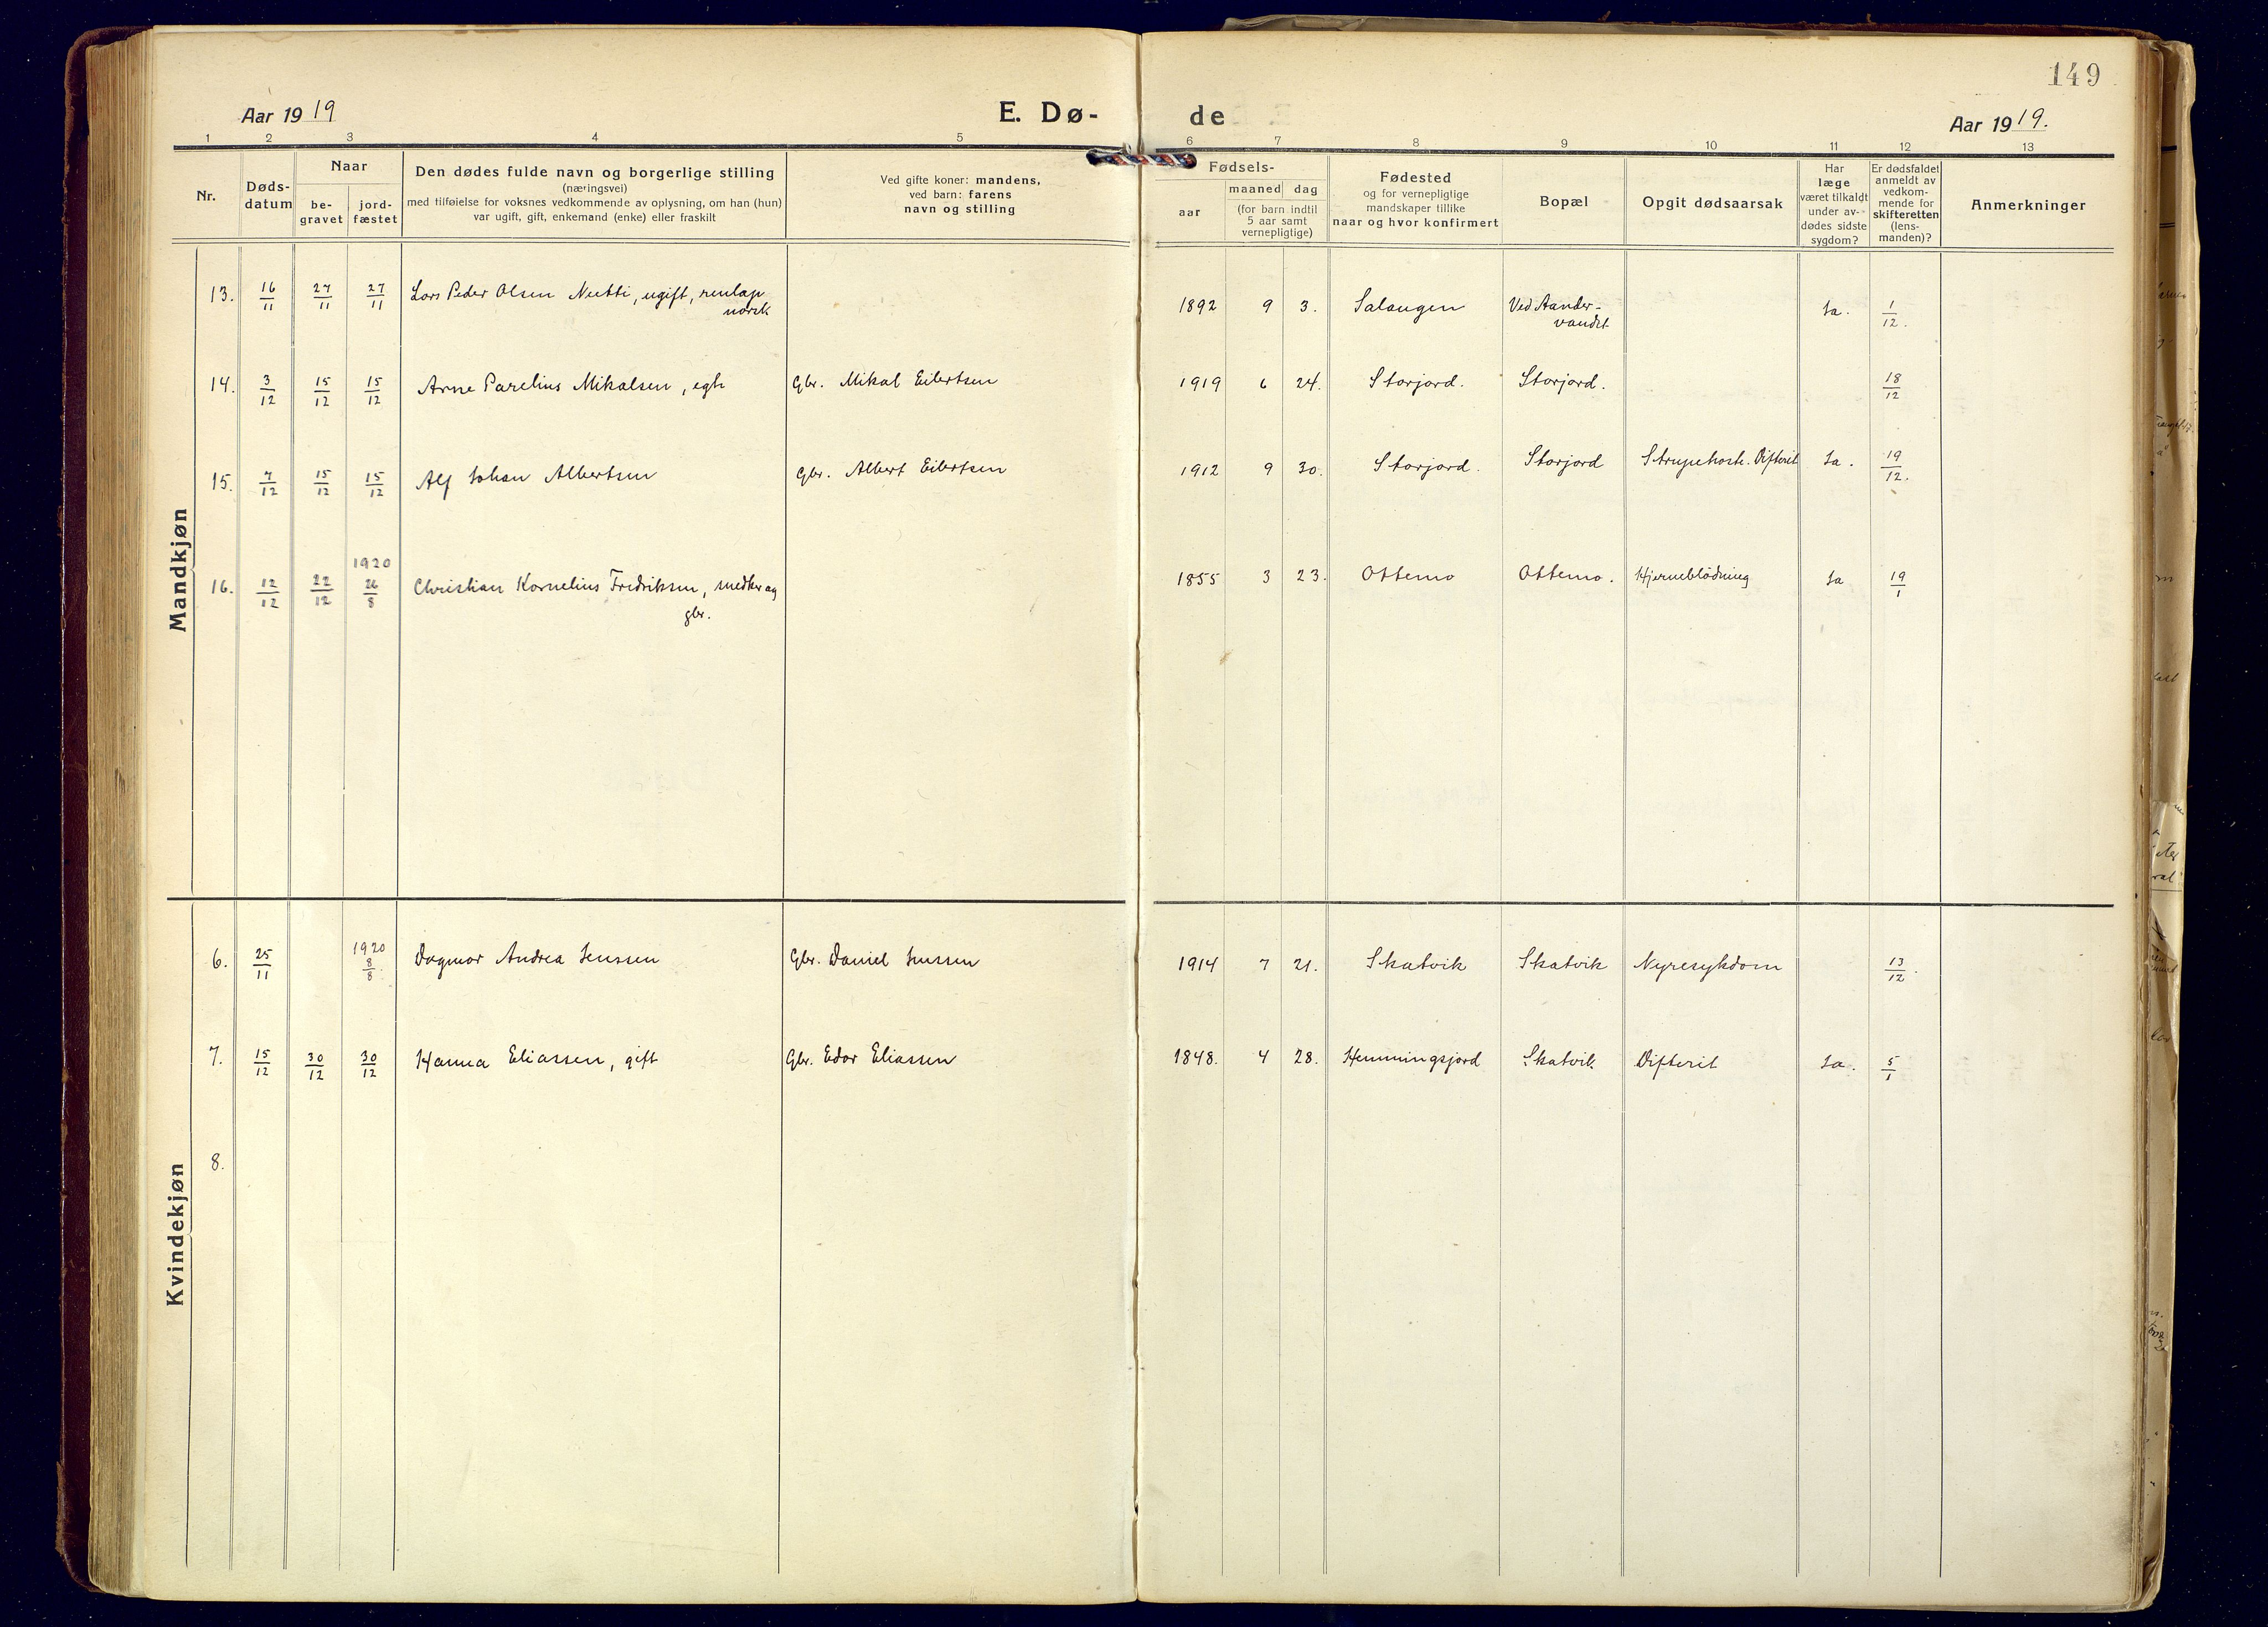 SATØ, Tranøy sokneprestkontor, I/Ia/Iaa: Ministerialbok nr. 16, 1919-1932, s. 149